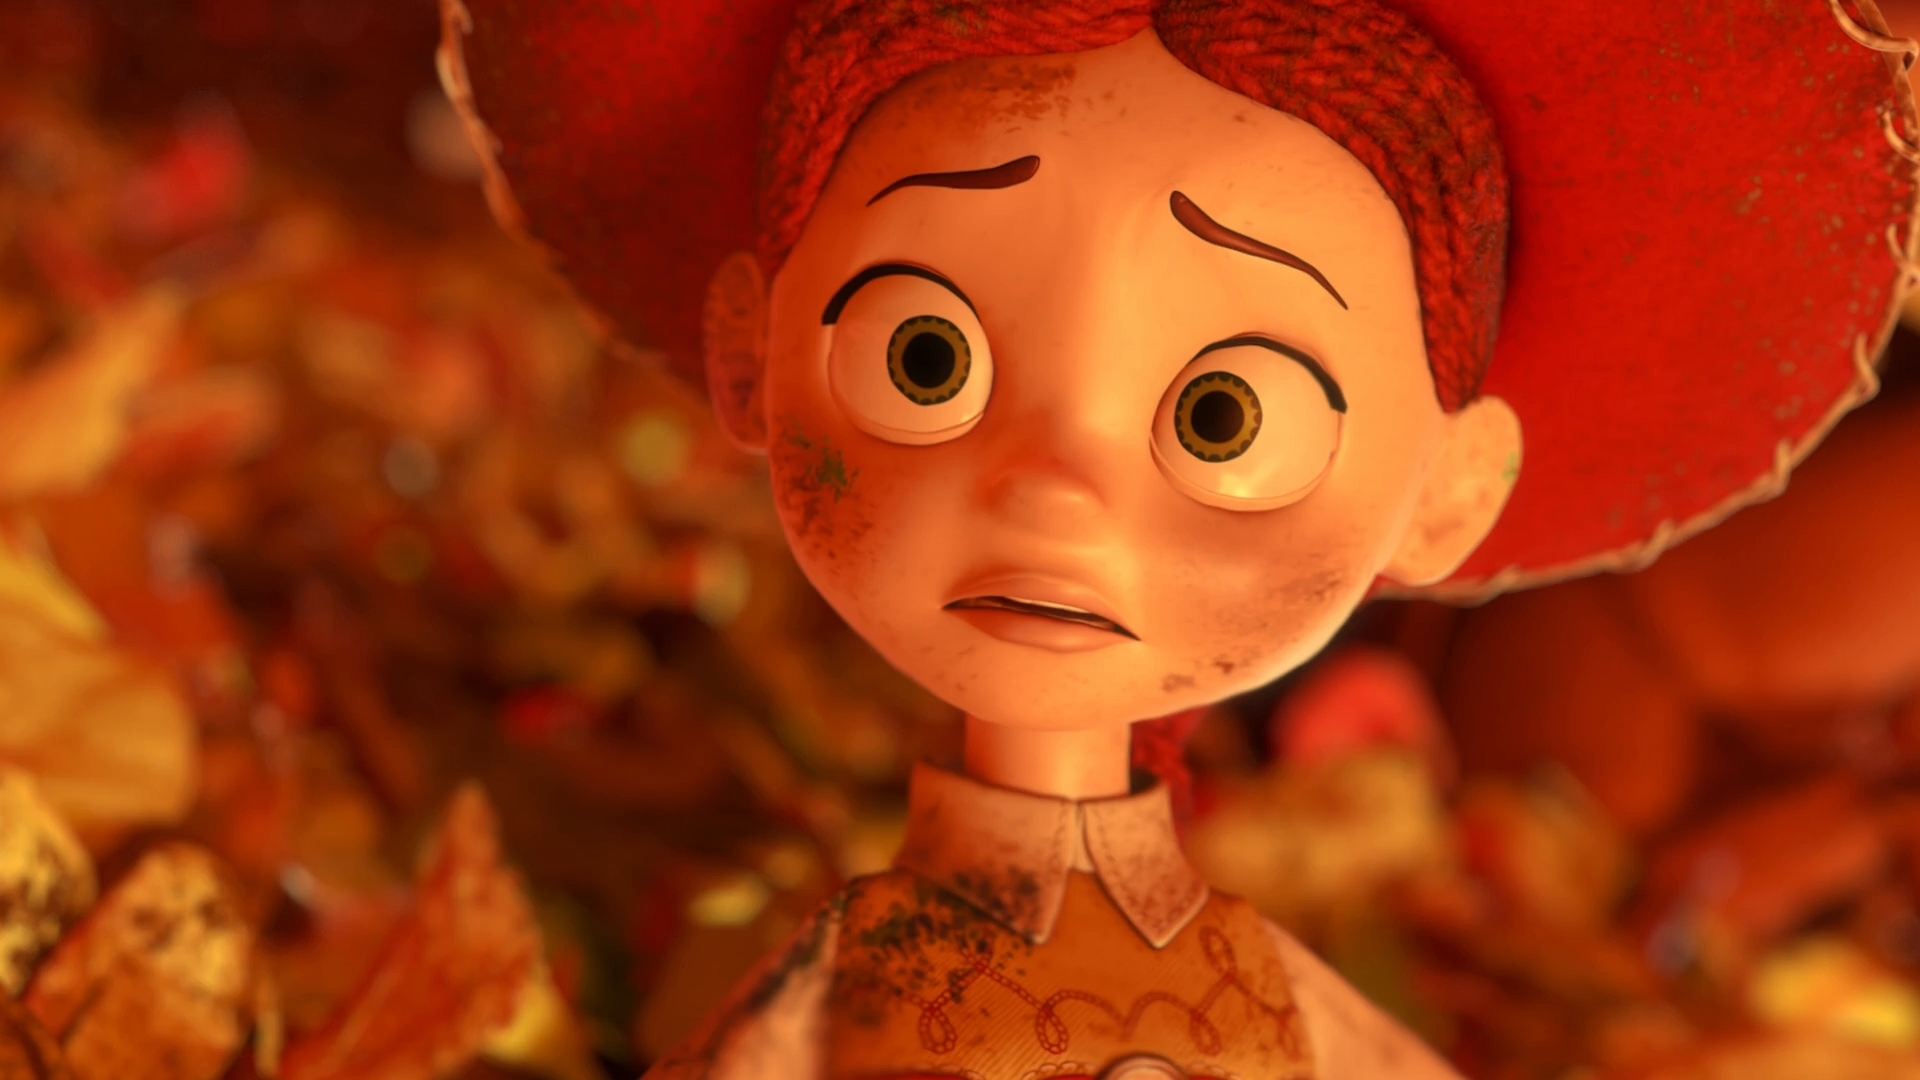 Toy Story Movies Collection 1995-2019 1080p BluRay x264 - LameyHost المجموعة الكاملة مدبلجة للغة العربية تحميل تورنت 8 arabp2p.com